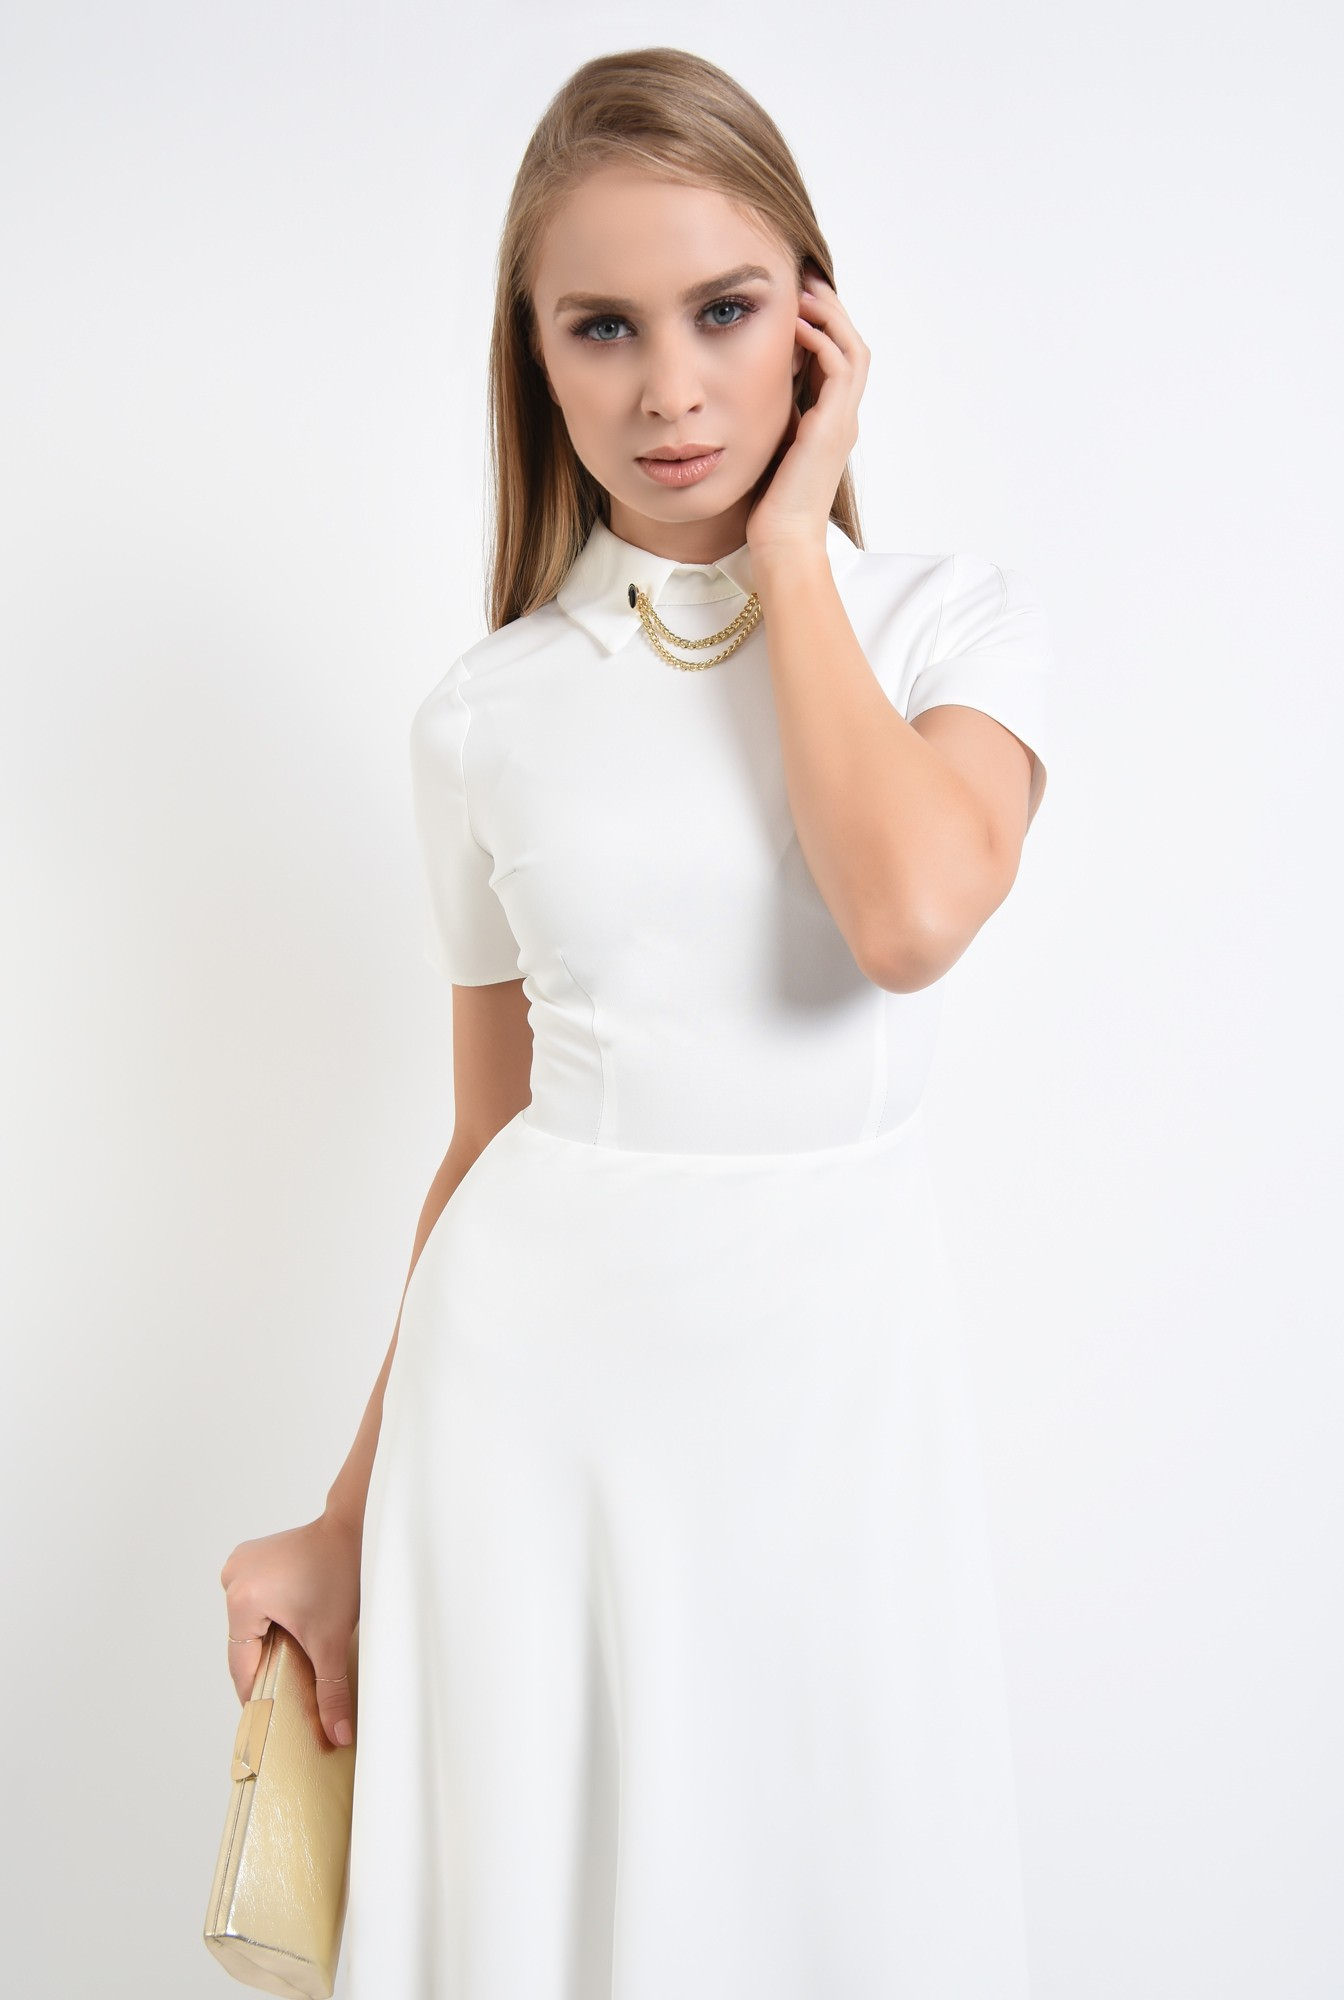 2 - 360 - rochie alba eleganta, bie, lungime medie